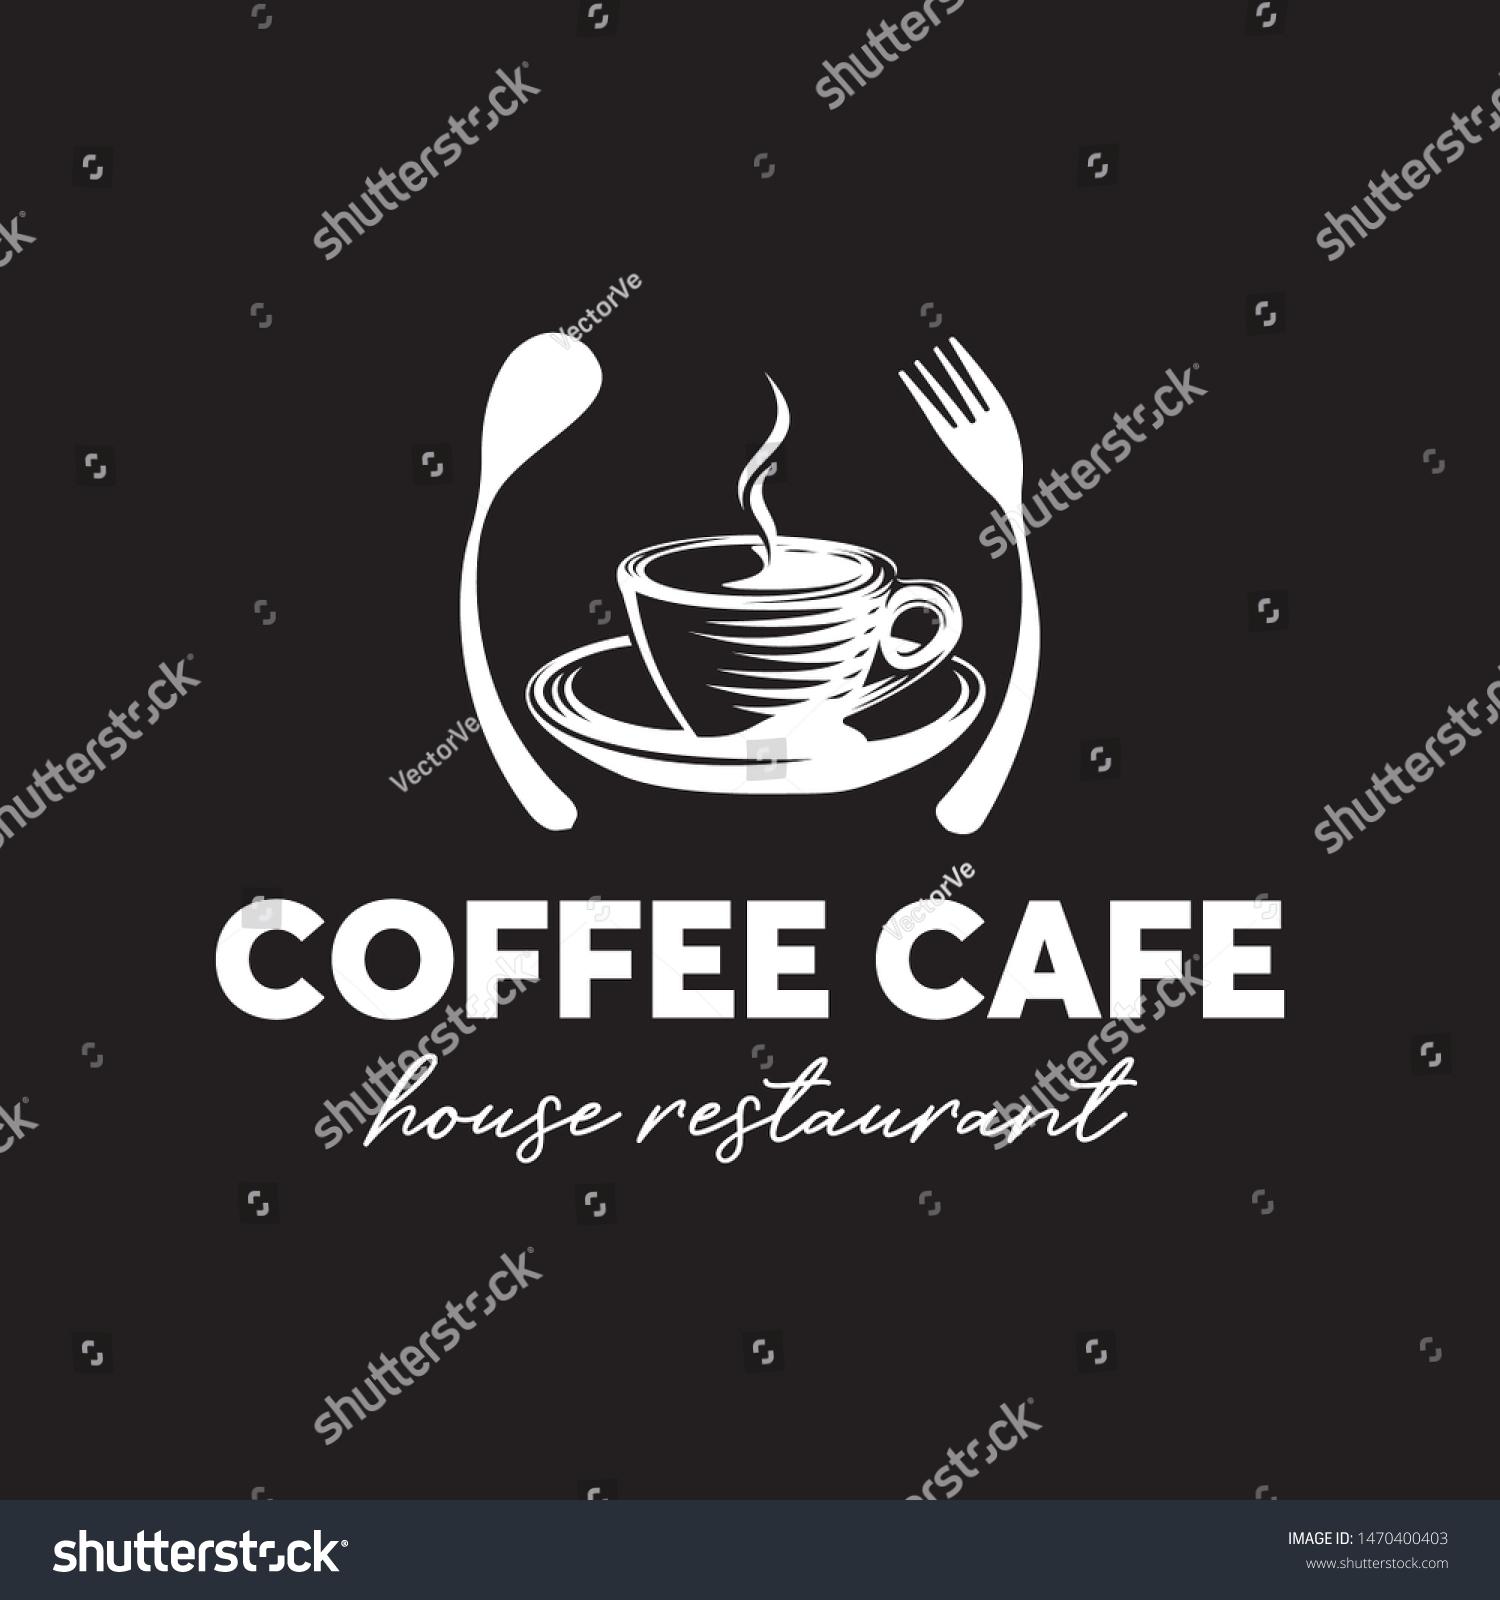 Coffee Cafe Restaurant Logo Design Template Stock Vector Royalty Free 1470400403